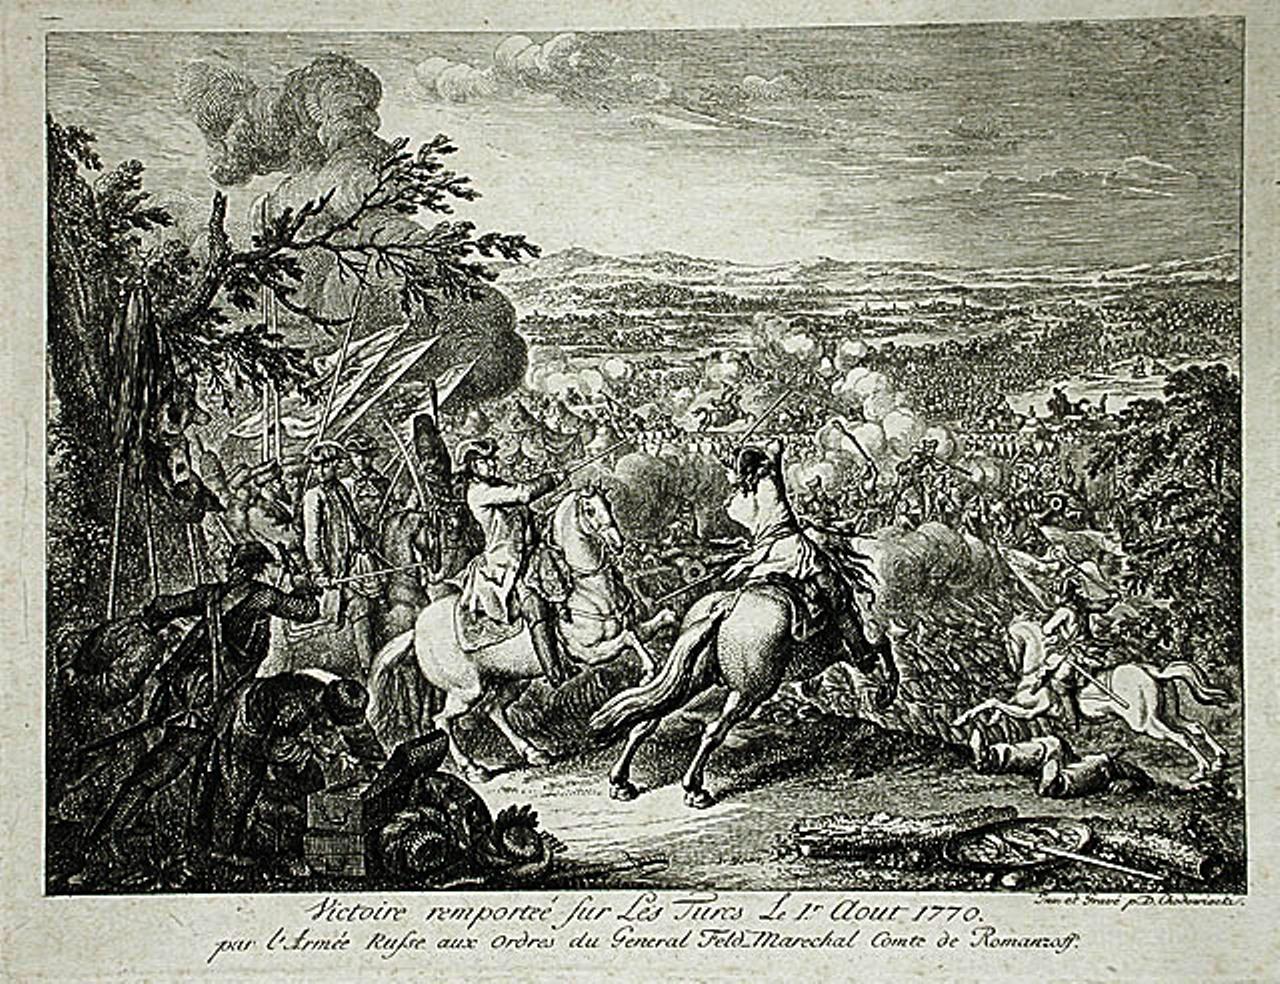 Романзофф зиг ам кахул 1770.jpg